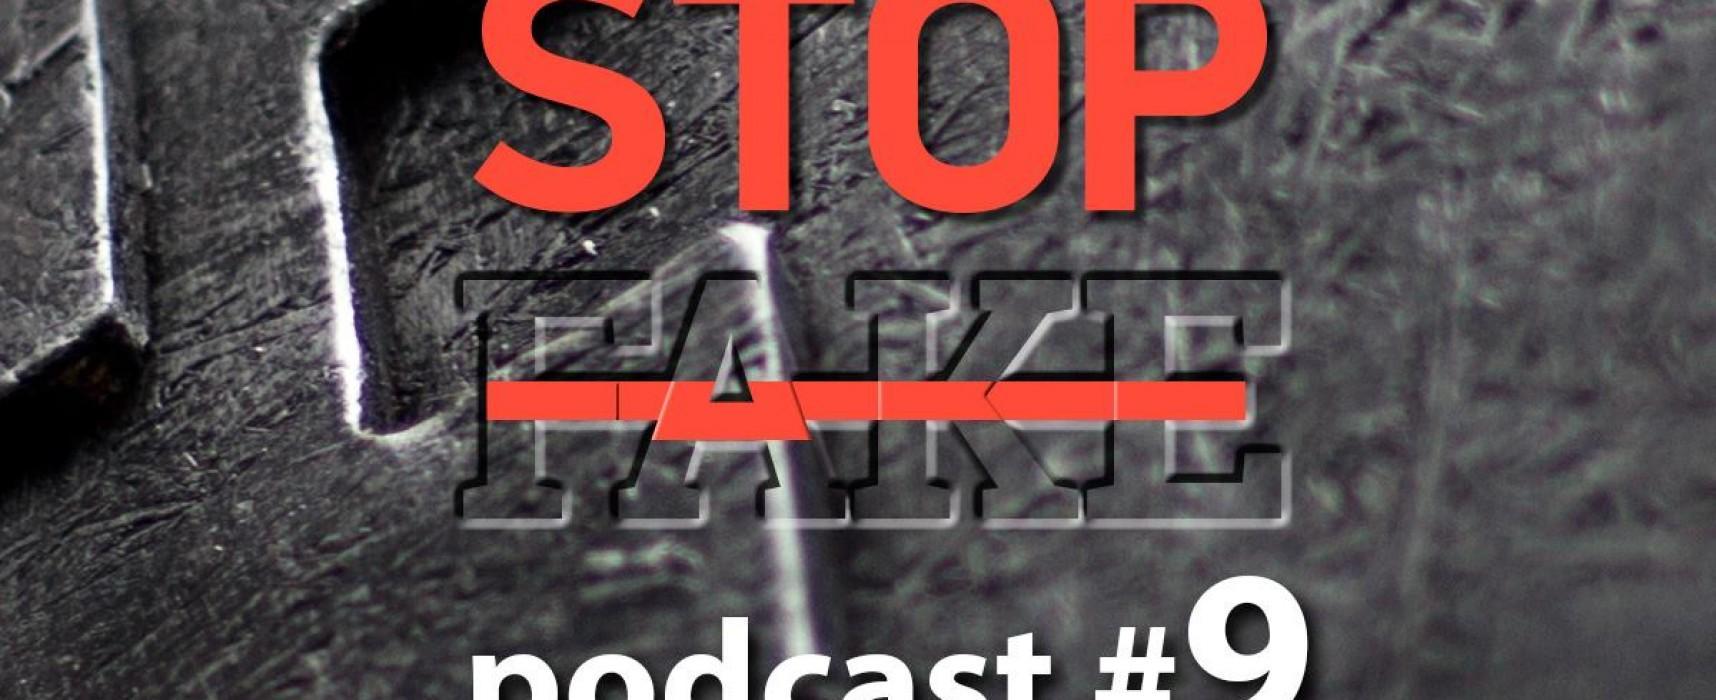 StopFake podcast #9